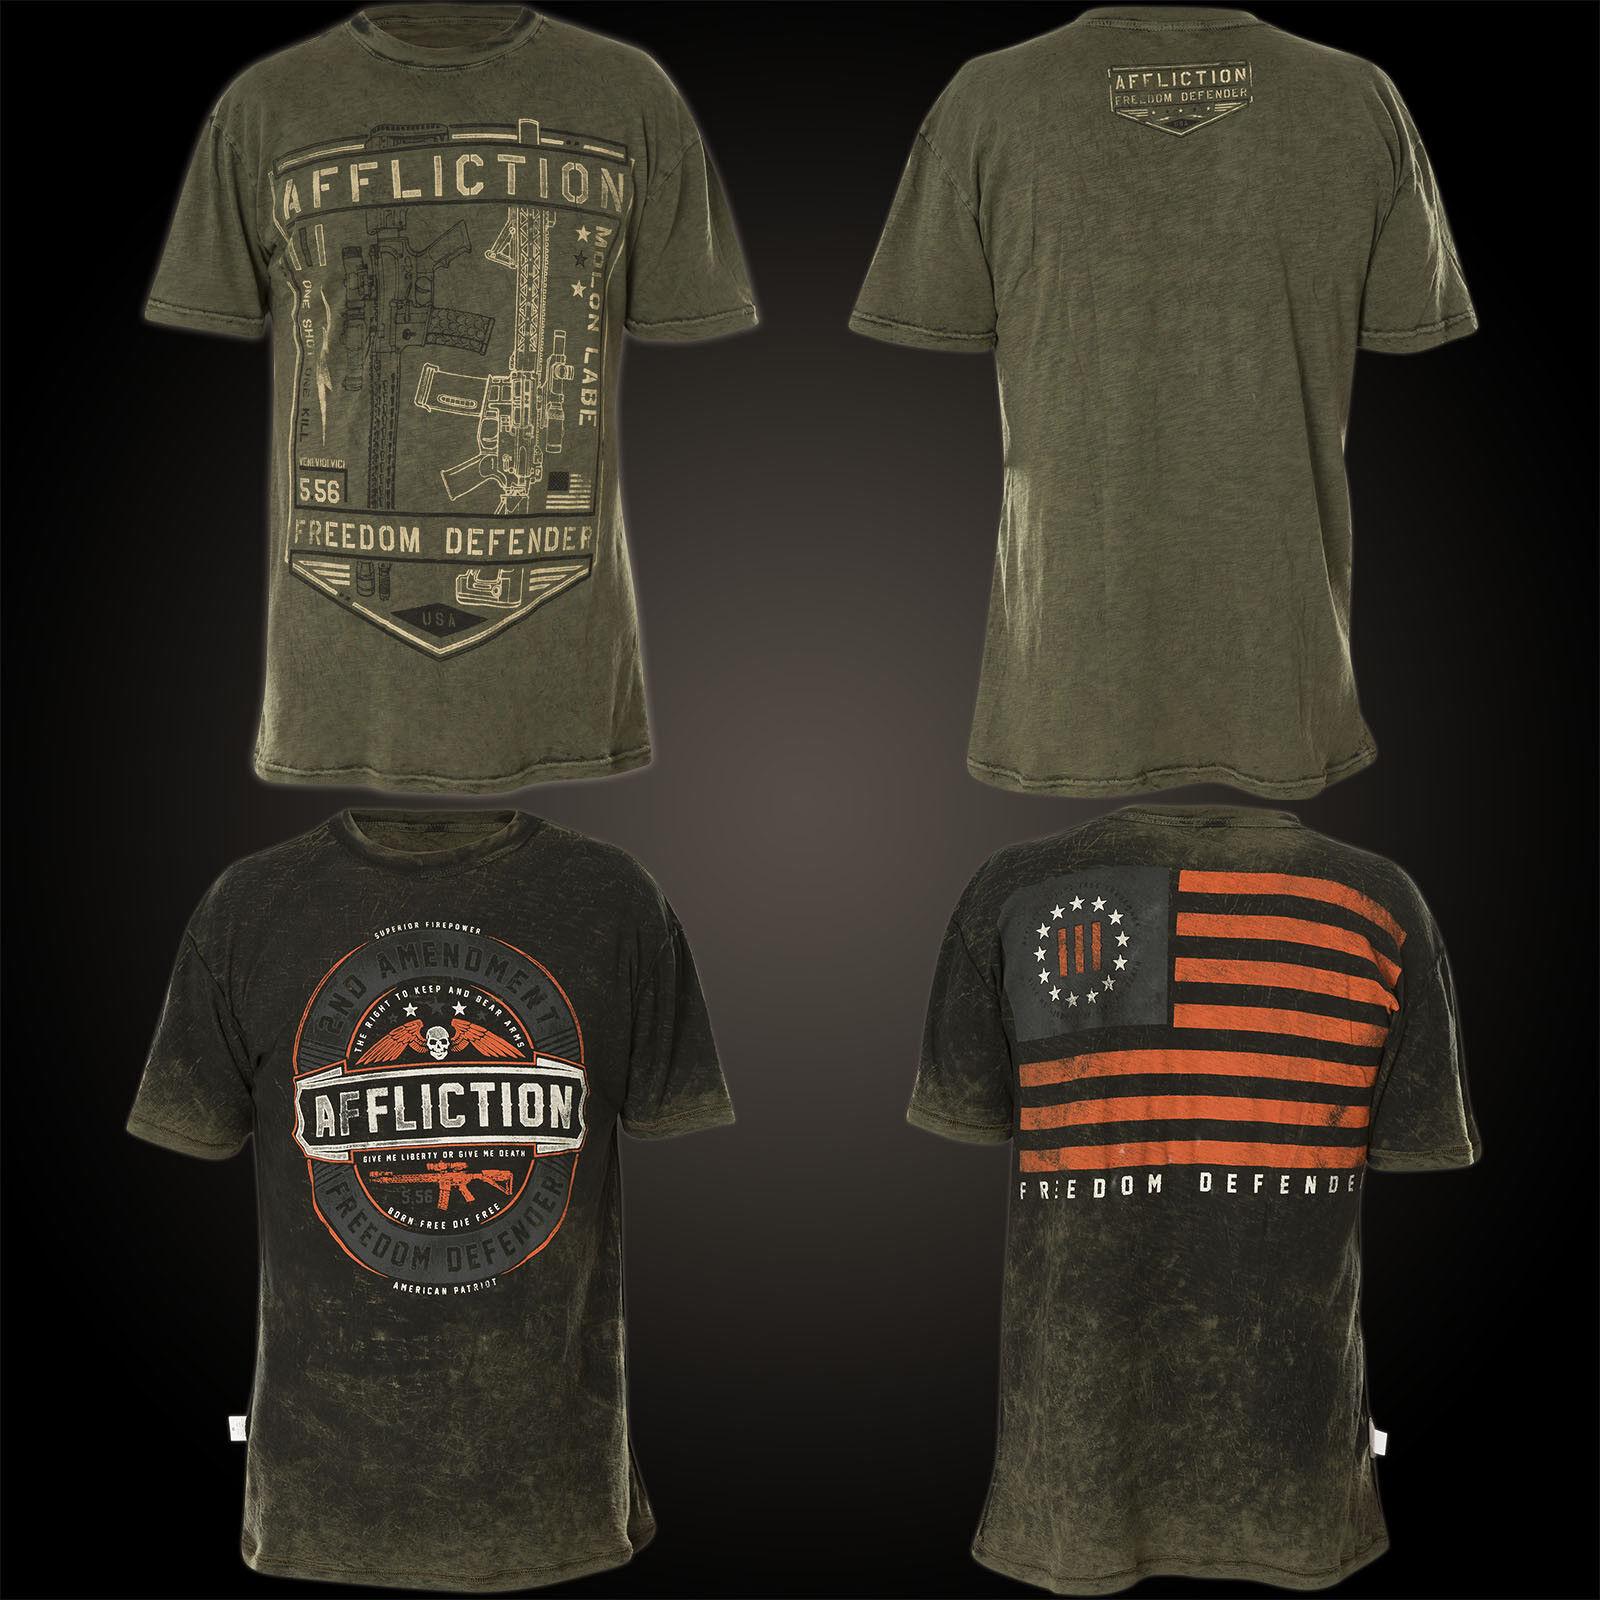 AFFLICTION T-Shirt Liberty Rev. Grün T-Shirts